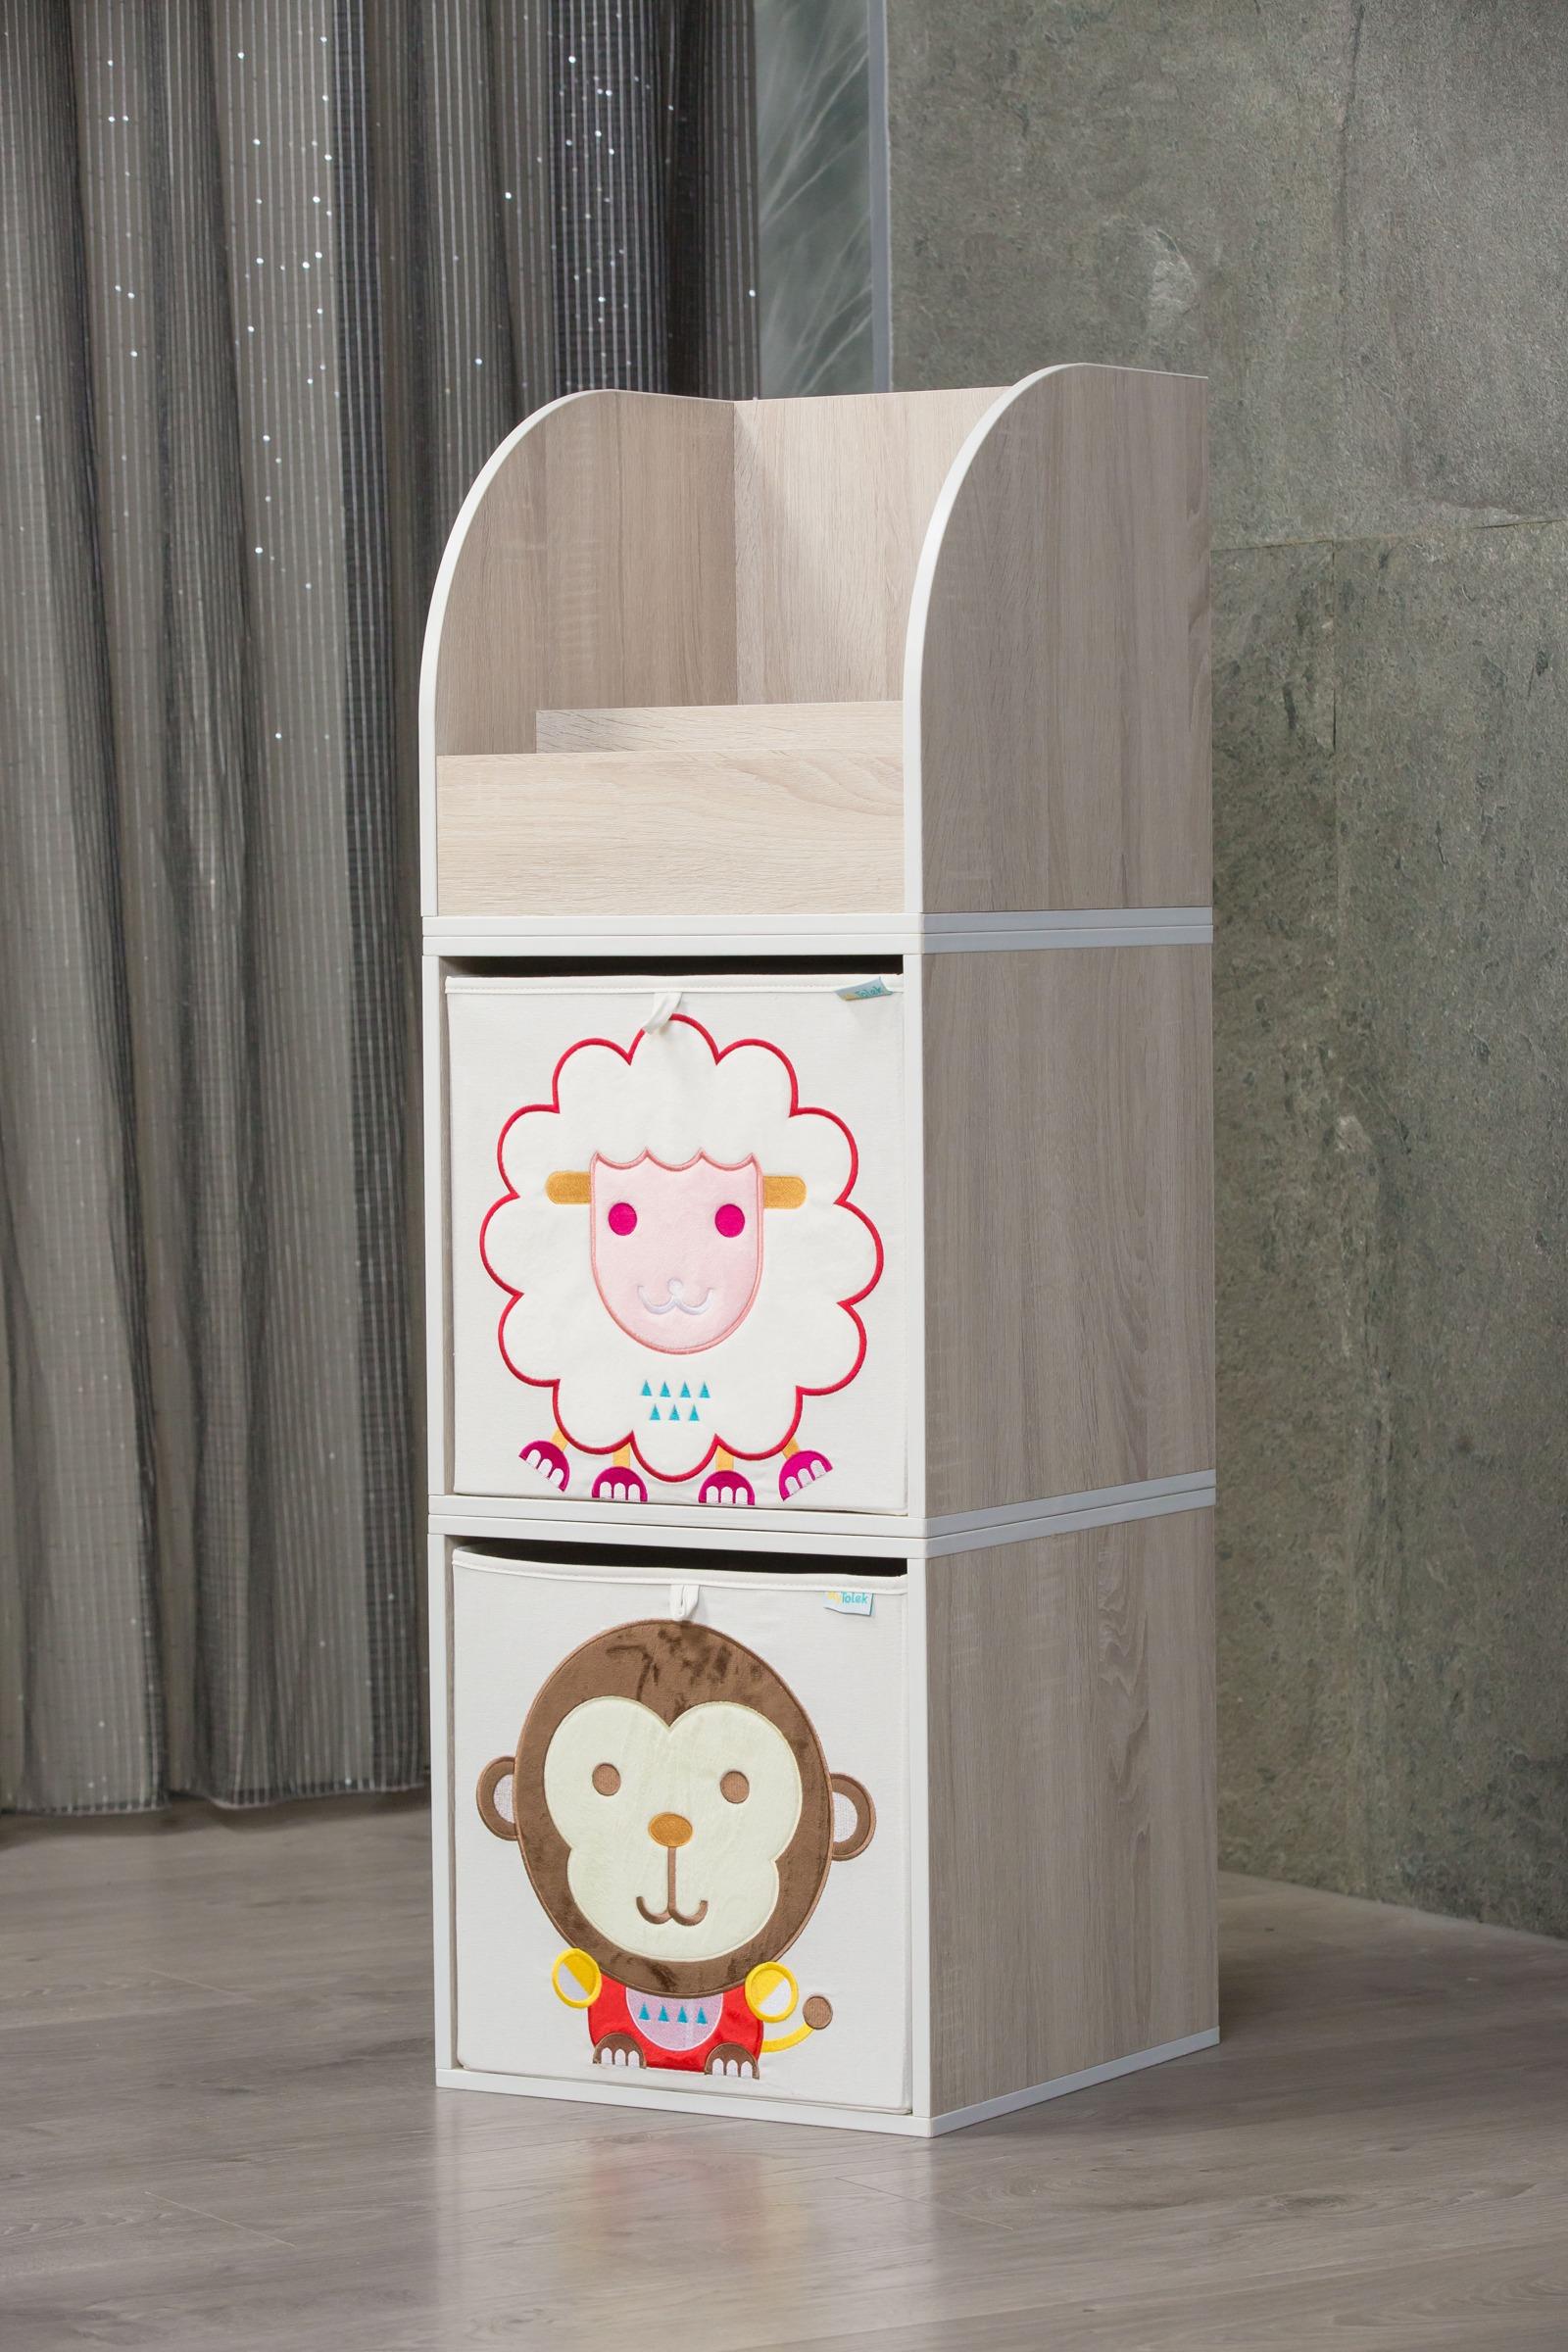 【MyTolek童乐可积木柜】我家就是儿童游戏室x超强收纳法! - yukiblog.tw